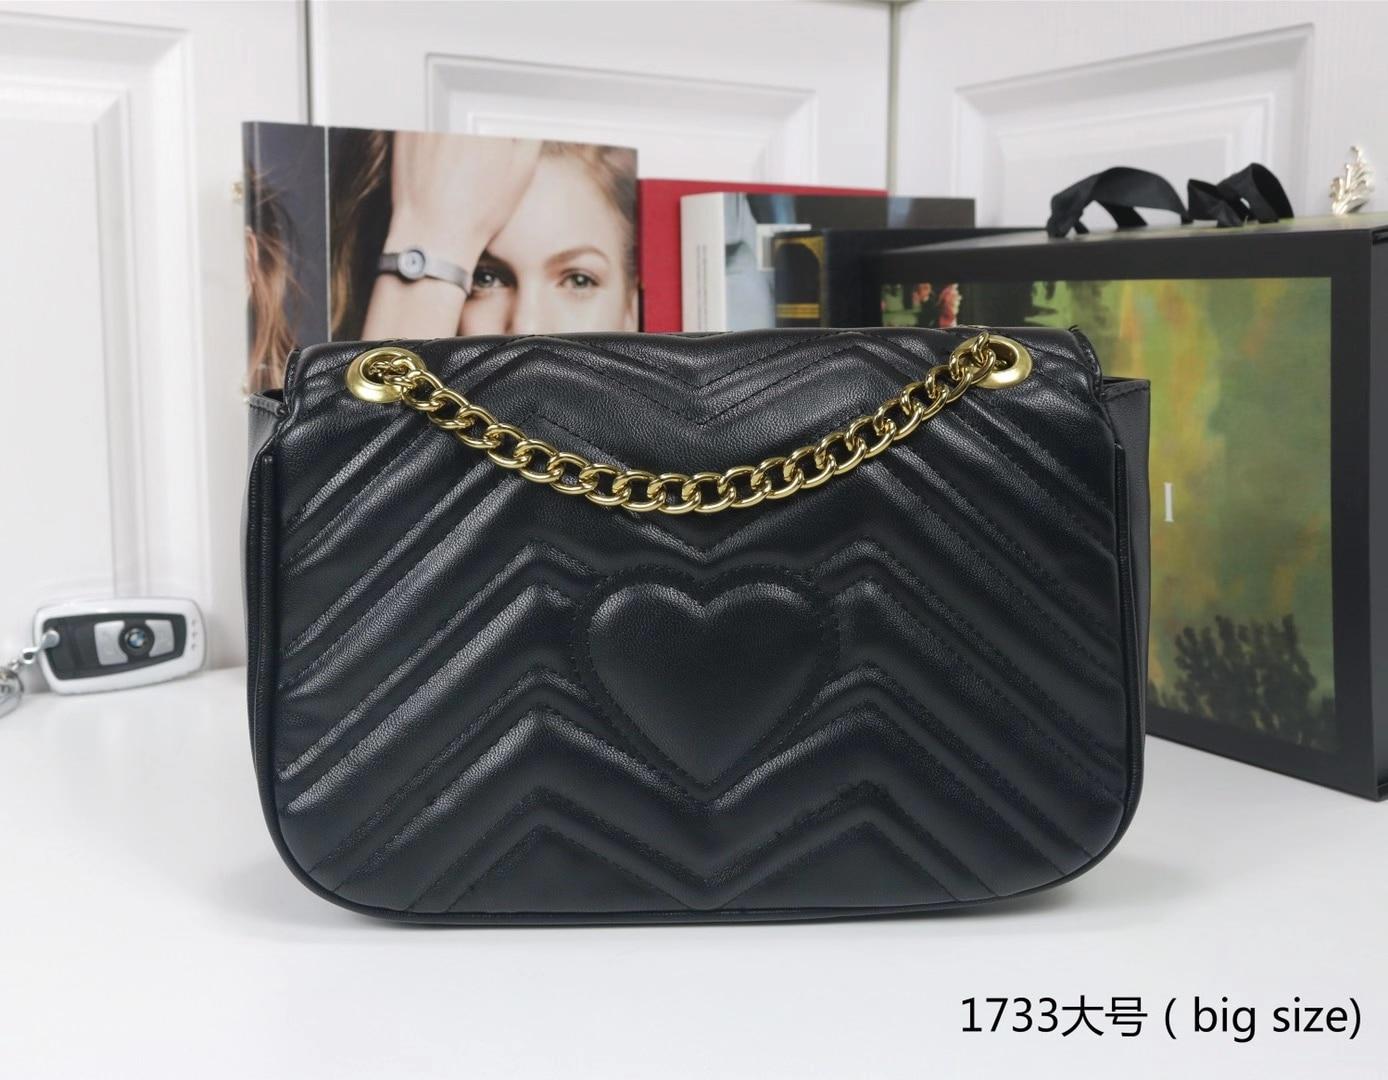 2021 Fashion Women V-line Crossbody Bag A Main Female Flap Shoulder V Bags Chain Bag Soft G&G Leather Handbag Lock Purses